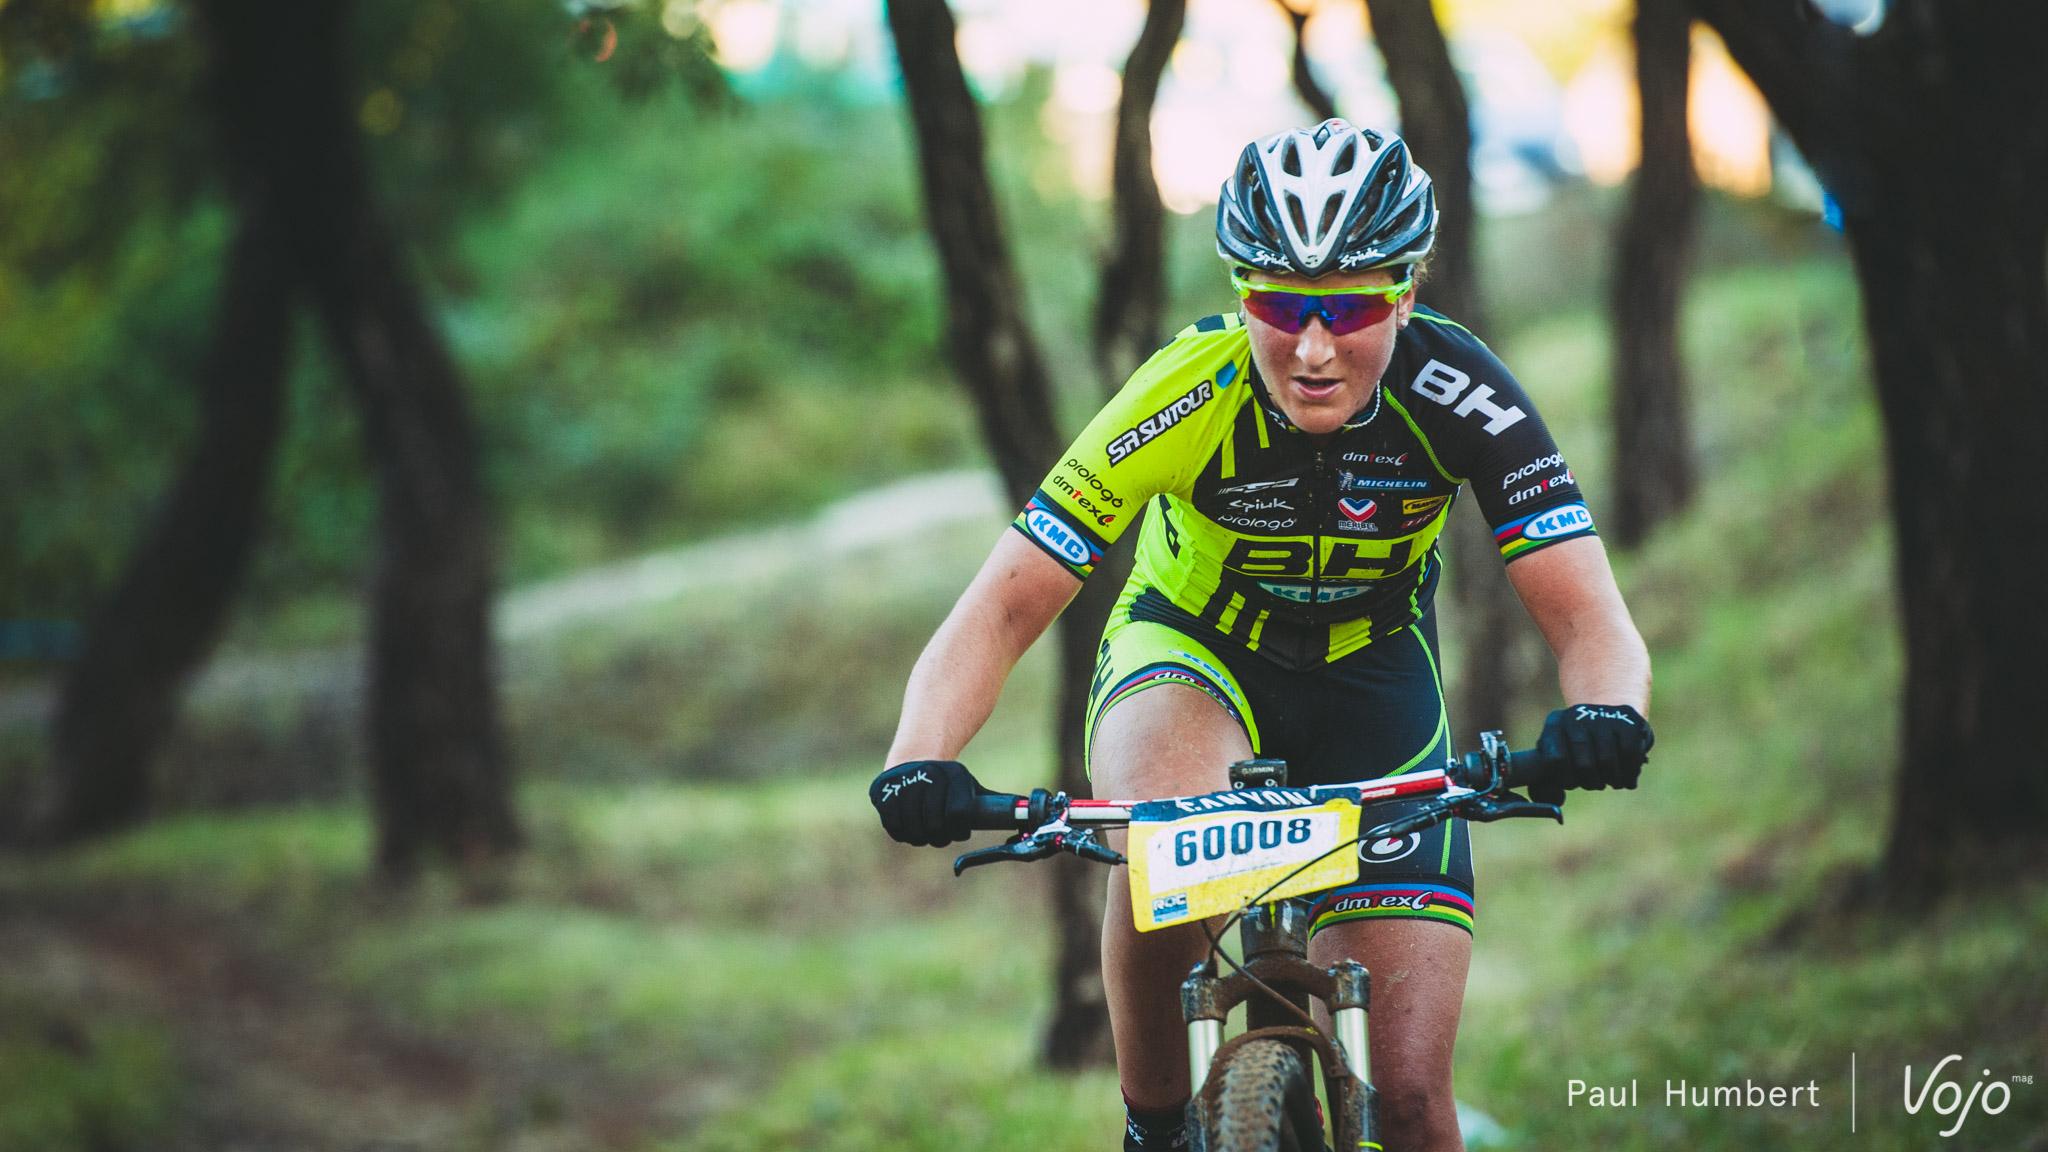 Roc-Azur-2015-Dimanche-Vojo-paul-humbert-11